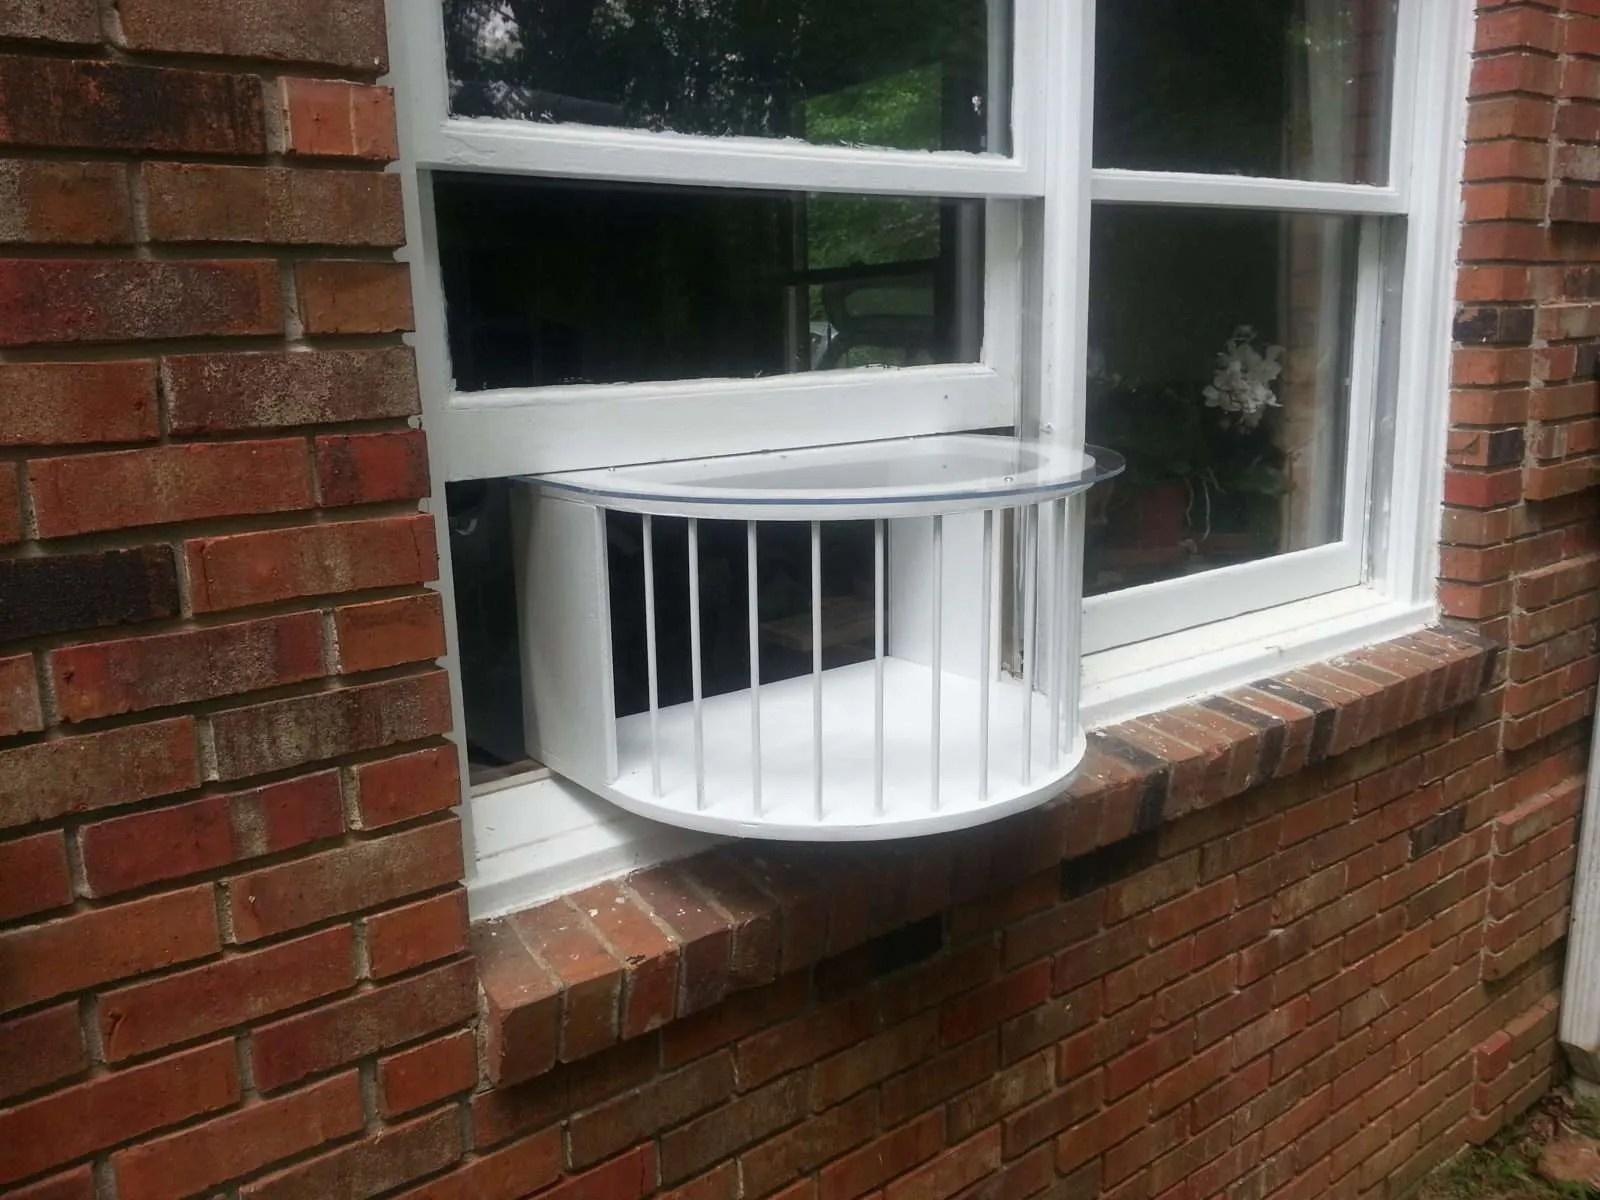 apartment balcony cat enclosure ? best balcony design ideas latest - Cat Patio Ideas